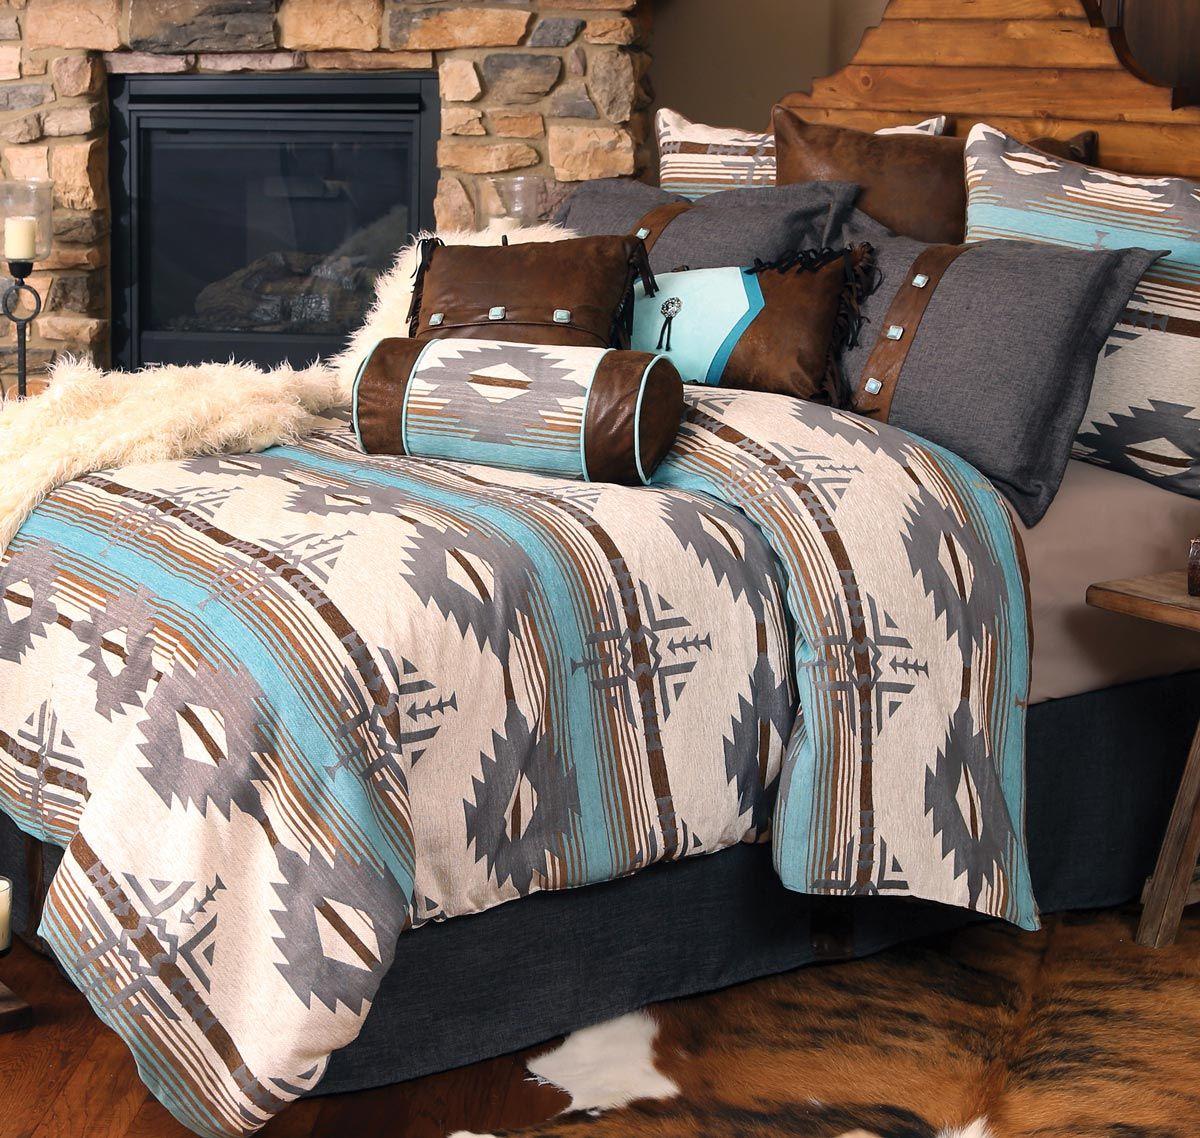 Dakota Sky Bed Set King With Images Western Home Decor